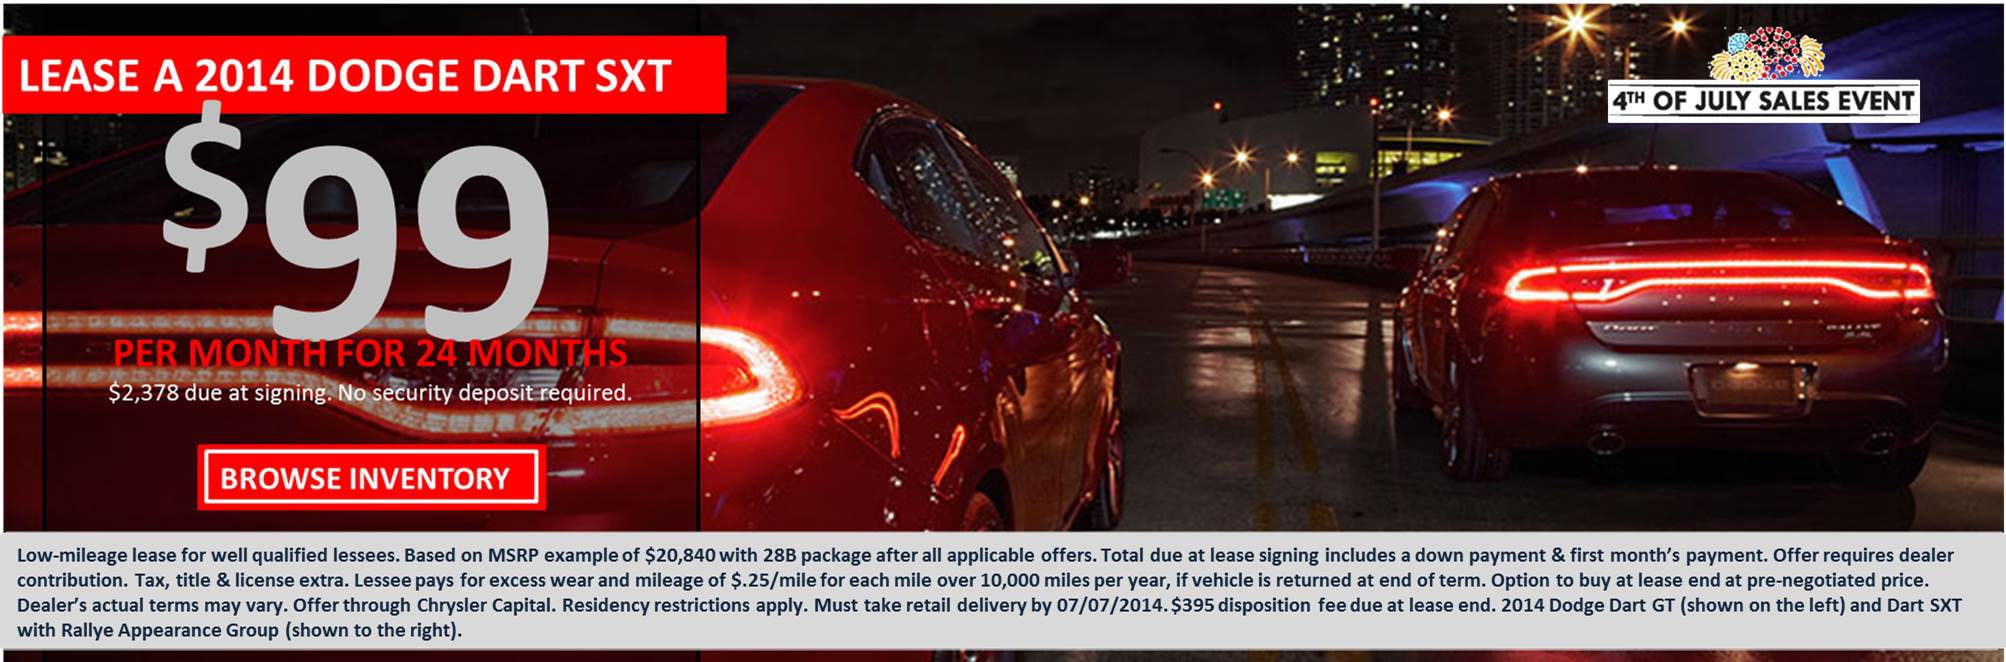 larry h miller dodge ram tucson serving sierra vista nogales. Cars Review. Best American Auto & Cars Review